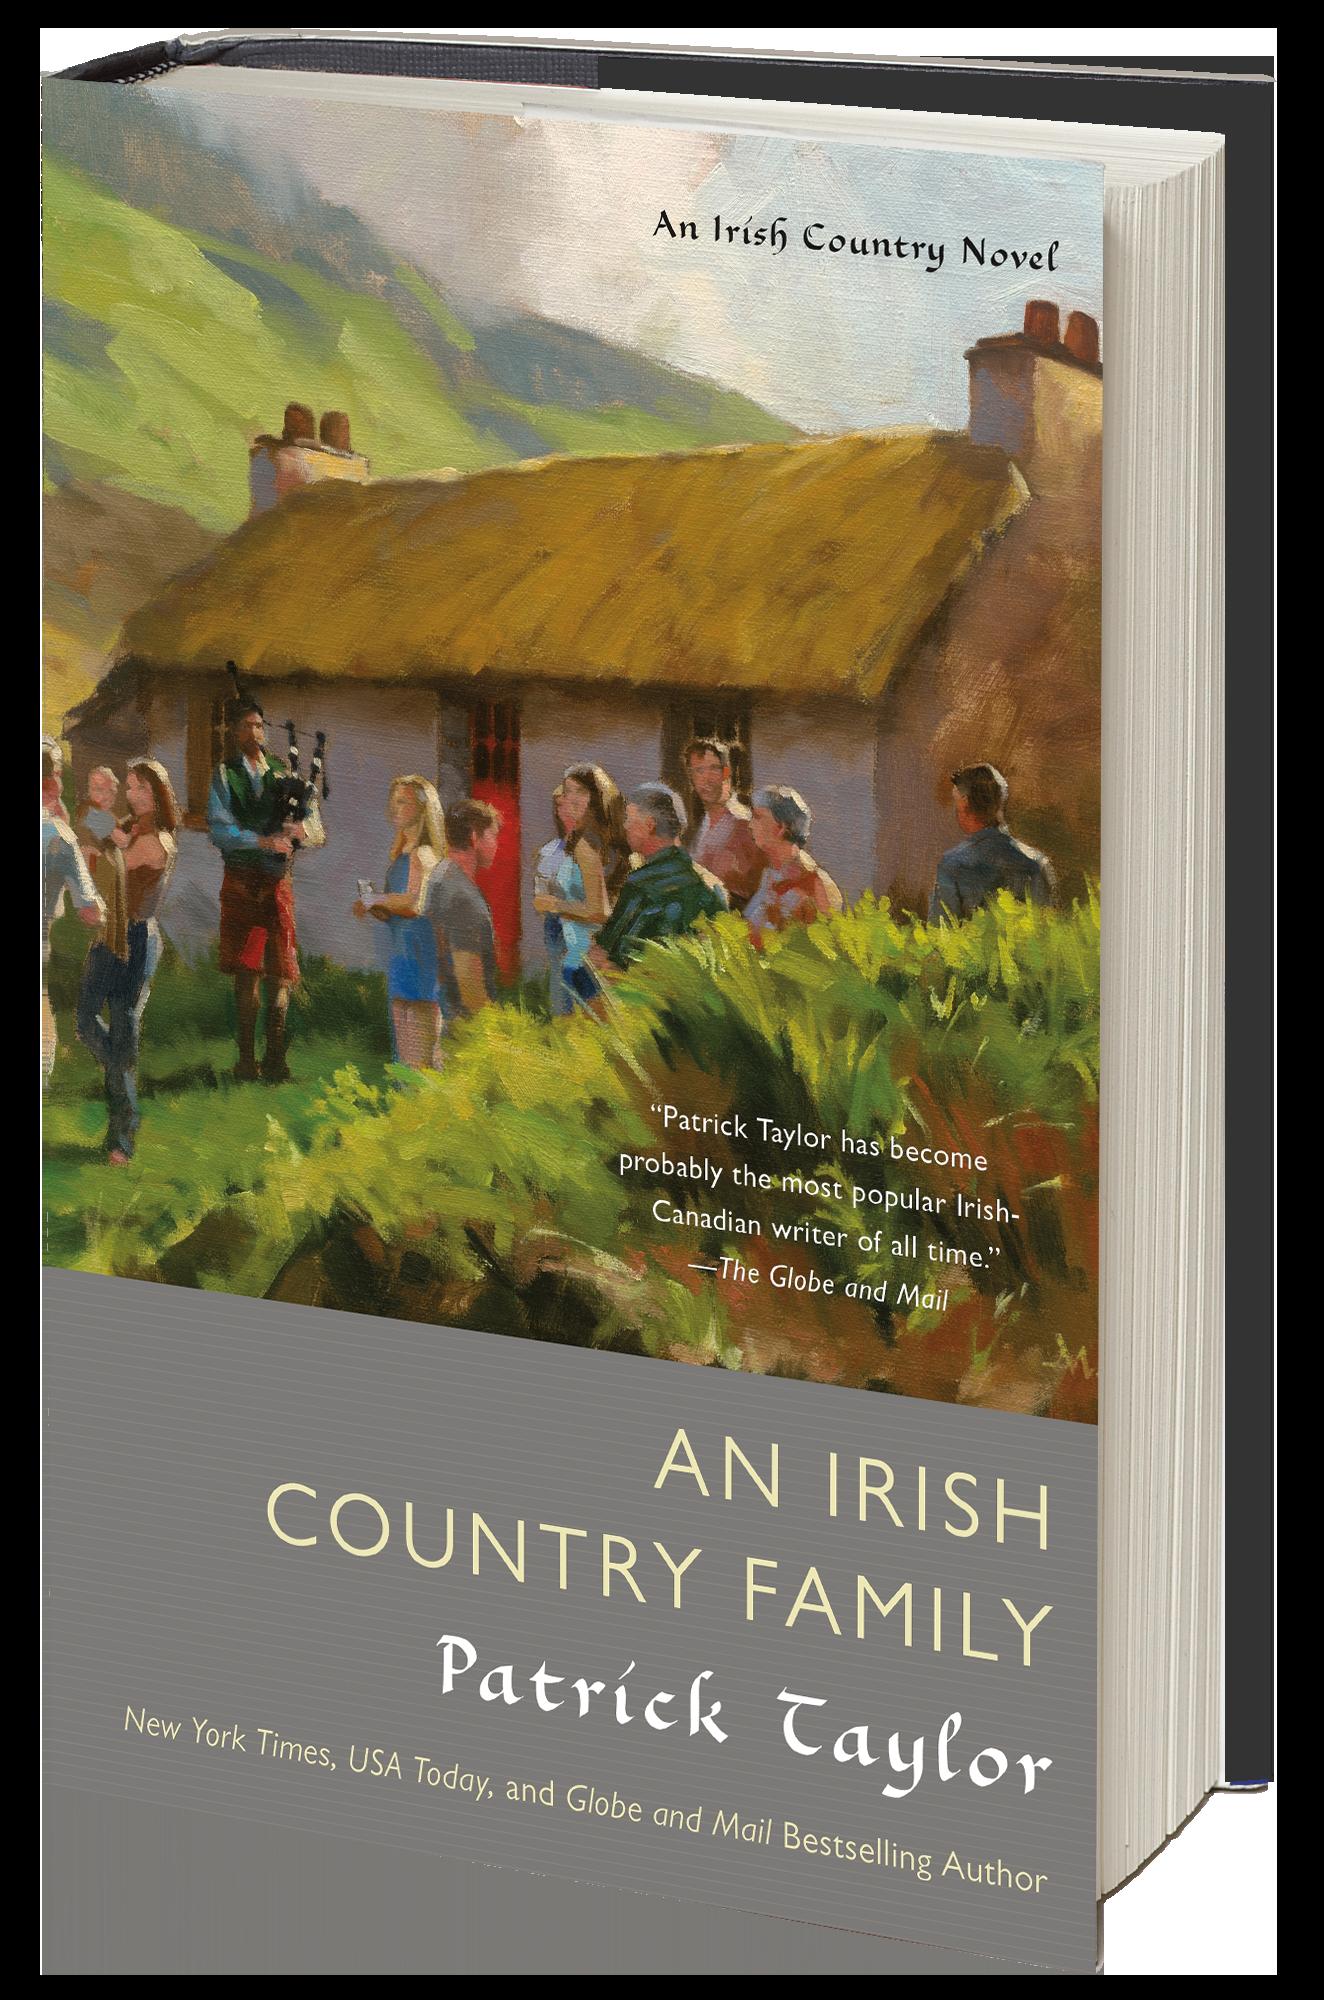 AN IRISH COUNTRY FAMILY